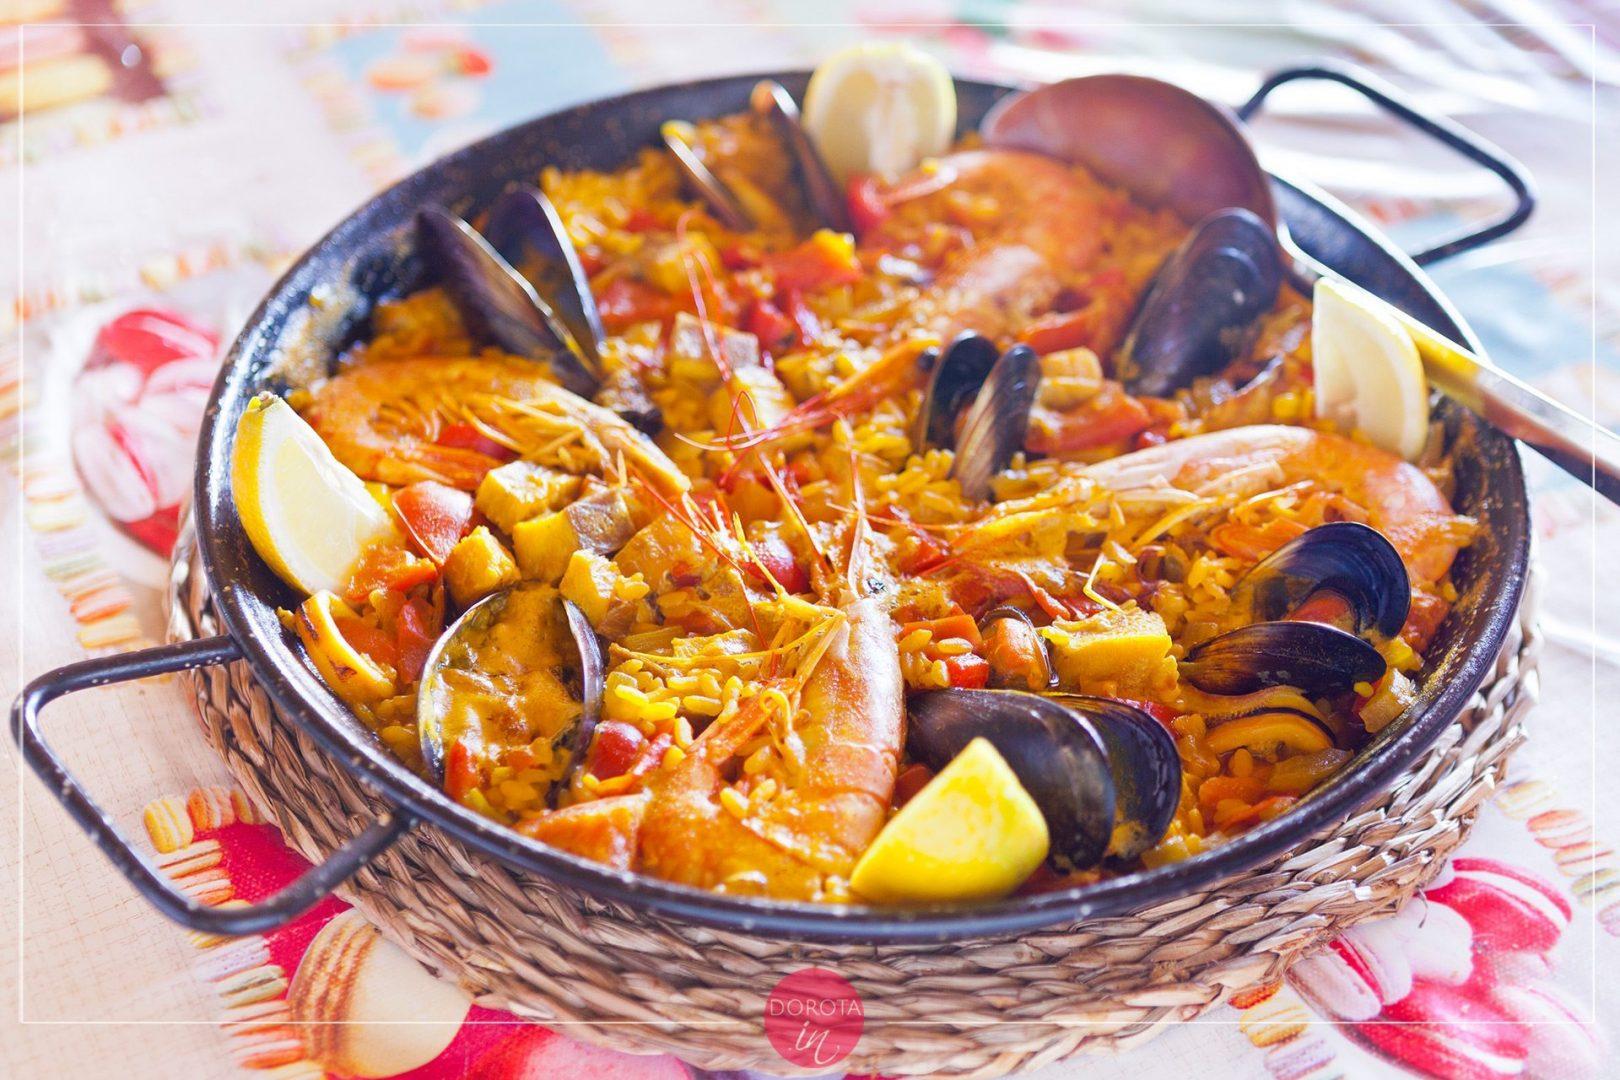 Paella z rybą i owocami morza